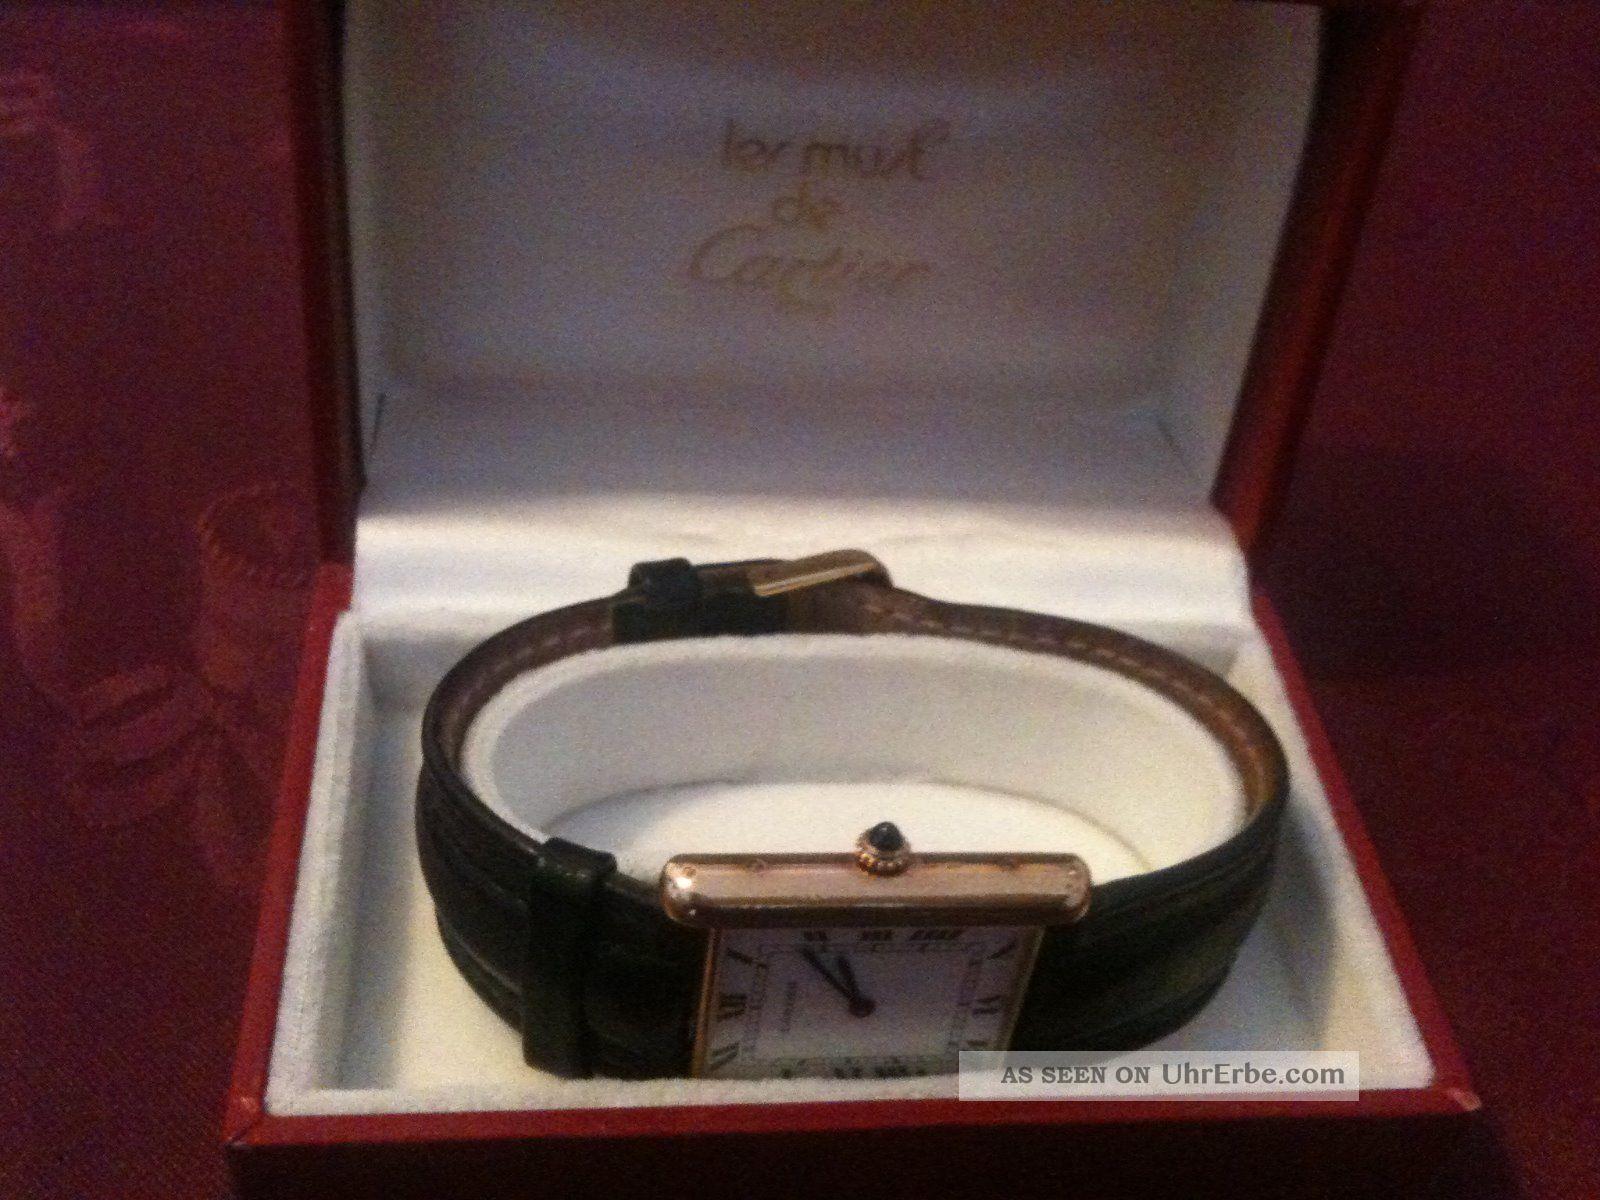 Herrenarmbanduhr Cartier Paris Tank Automatic Gold Armbanduhren Bild